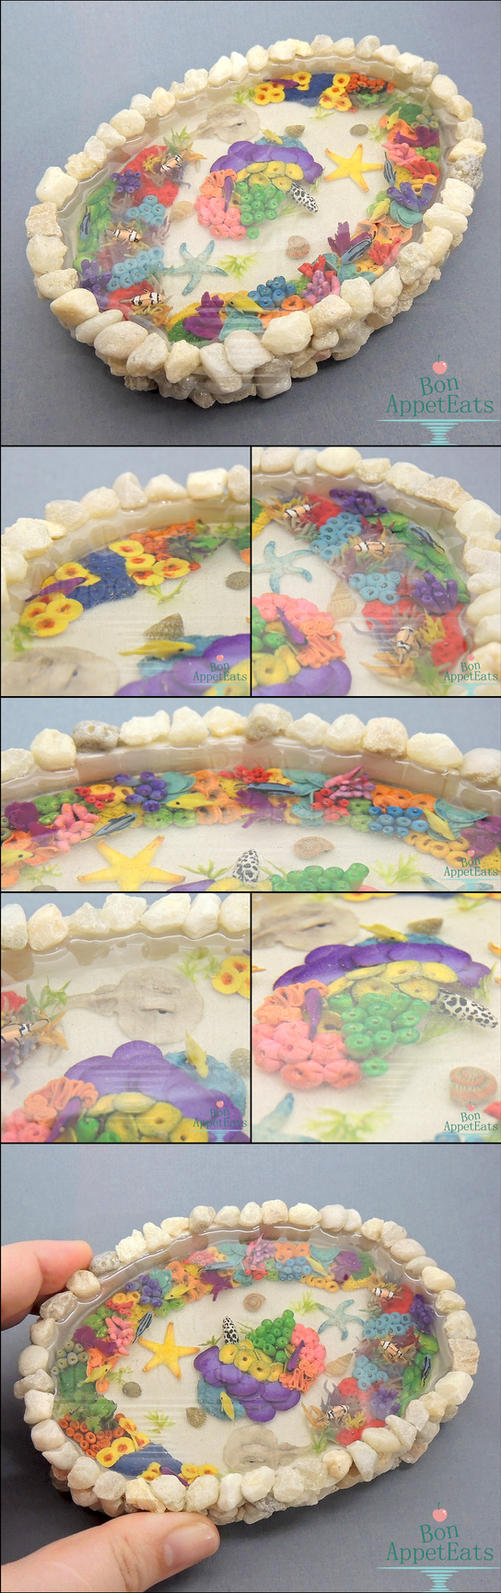 Commission: Miniature Coral Reef Pond by Bon-AppetEats